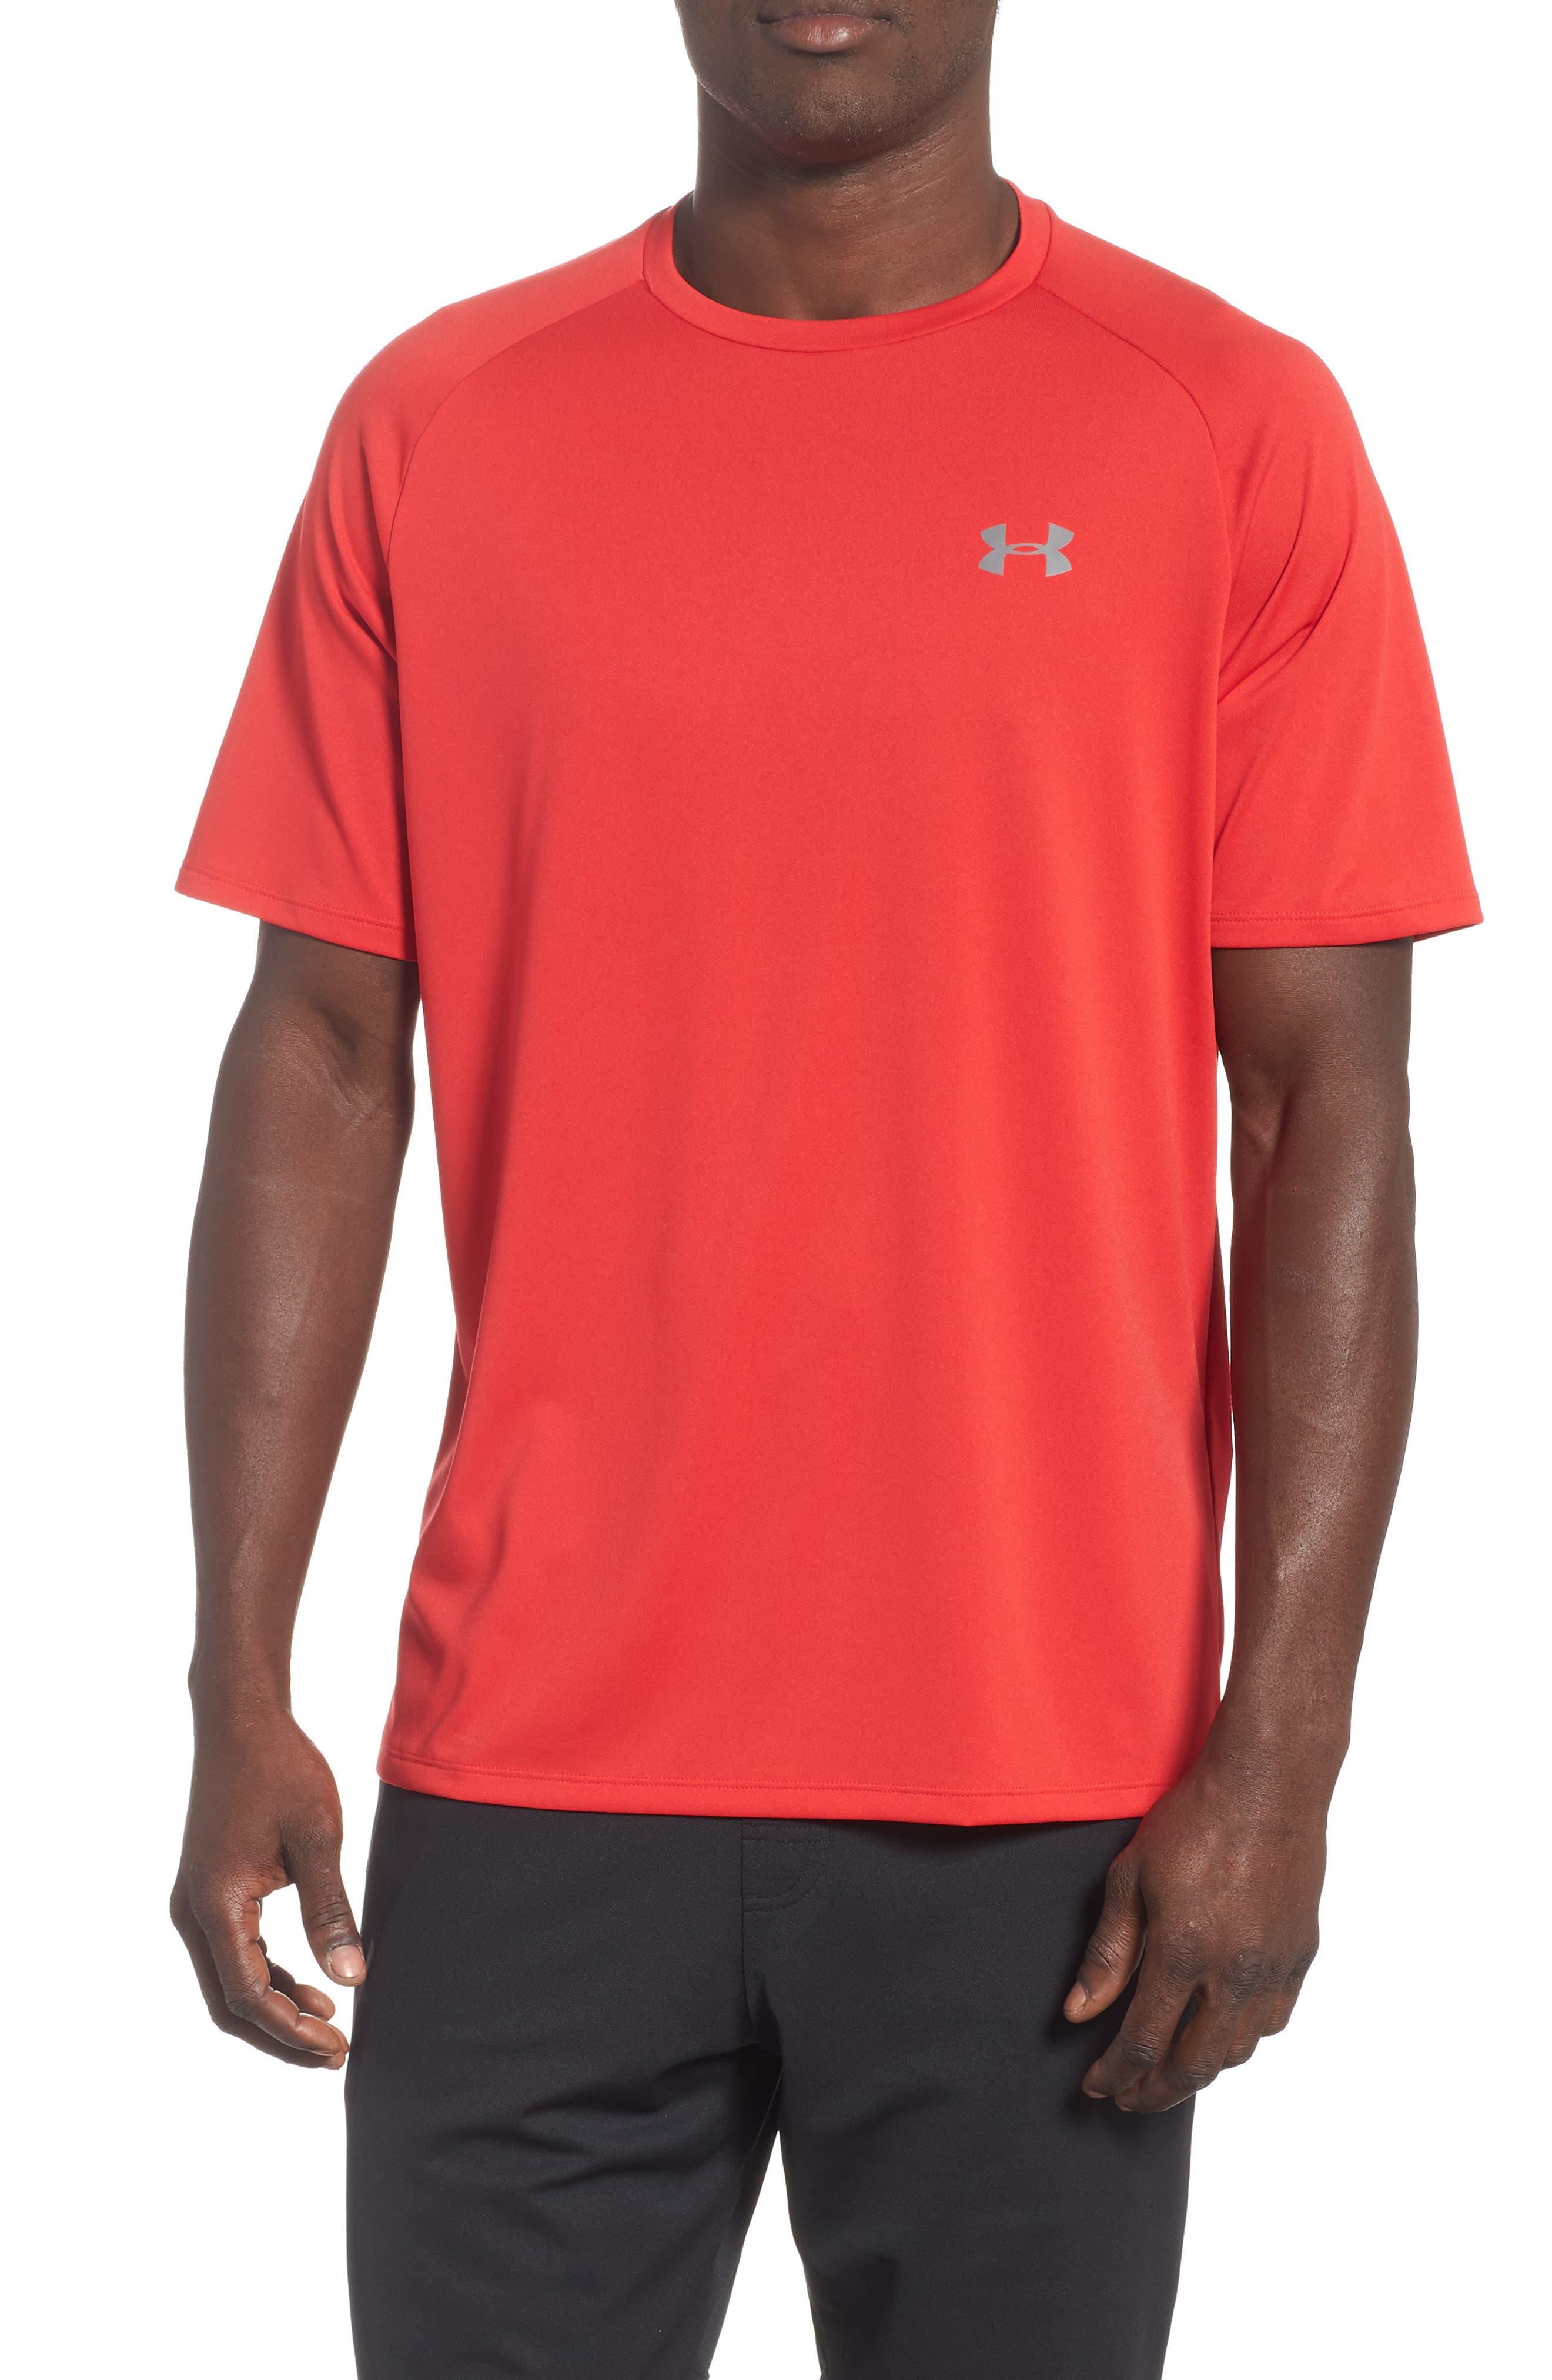 Under Armour T-shirts UA TECH(TM) T-SHIRT